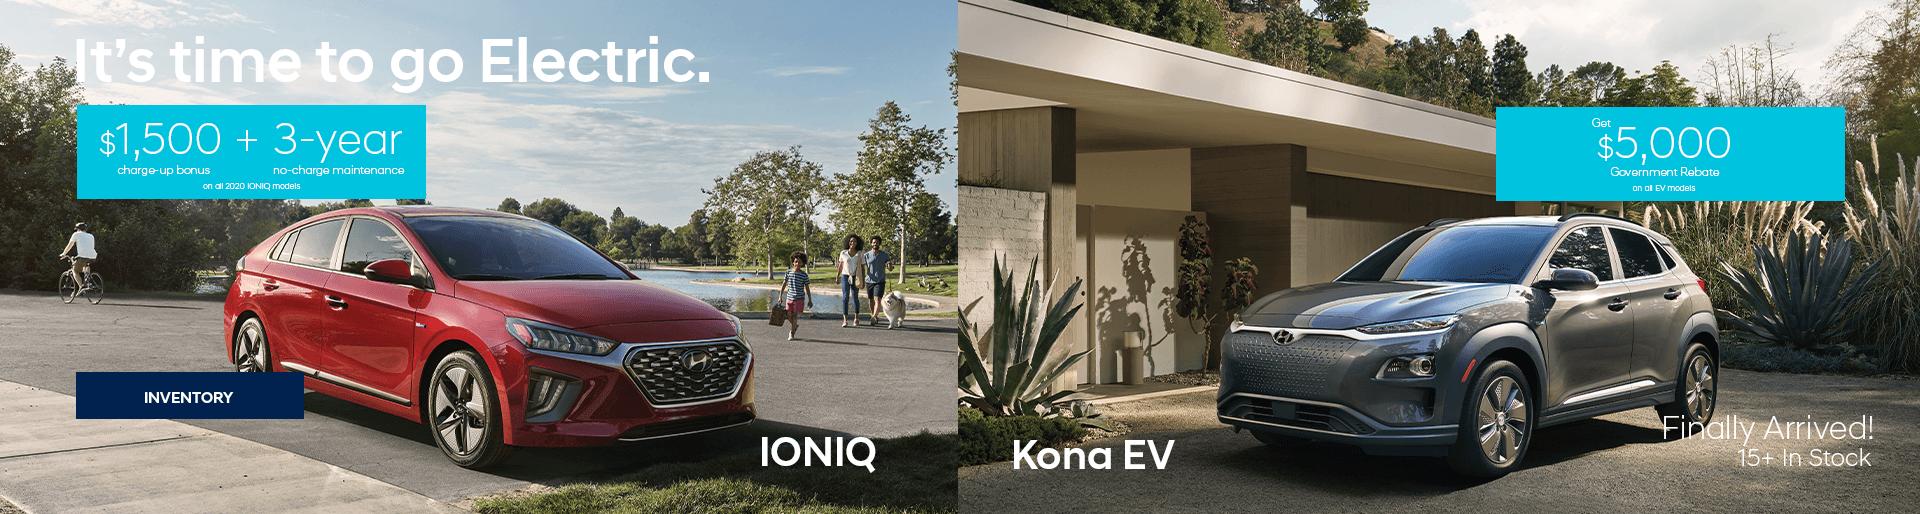 Kona-EV-and-Ioniq2-0x0